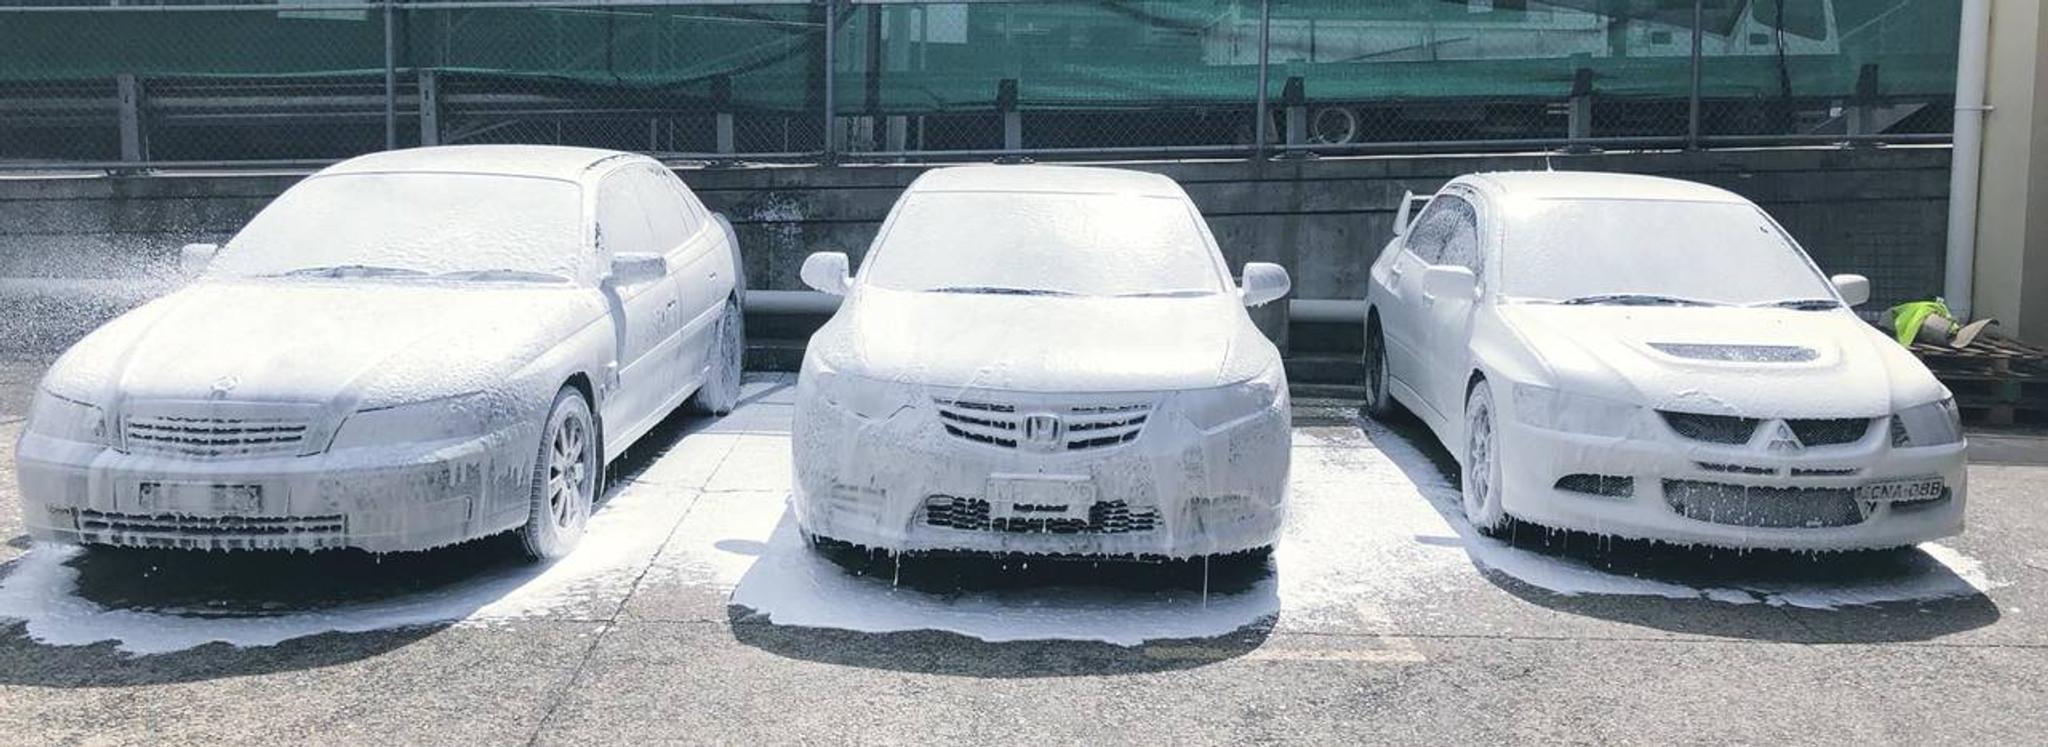 Polar Blast Snow Foam 2 5l Part No Ngaurpb002 5 Phil Gilbert Hyundai